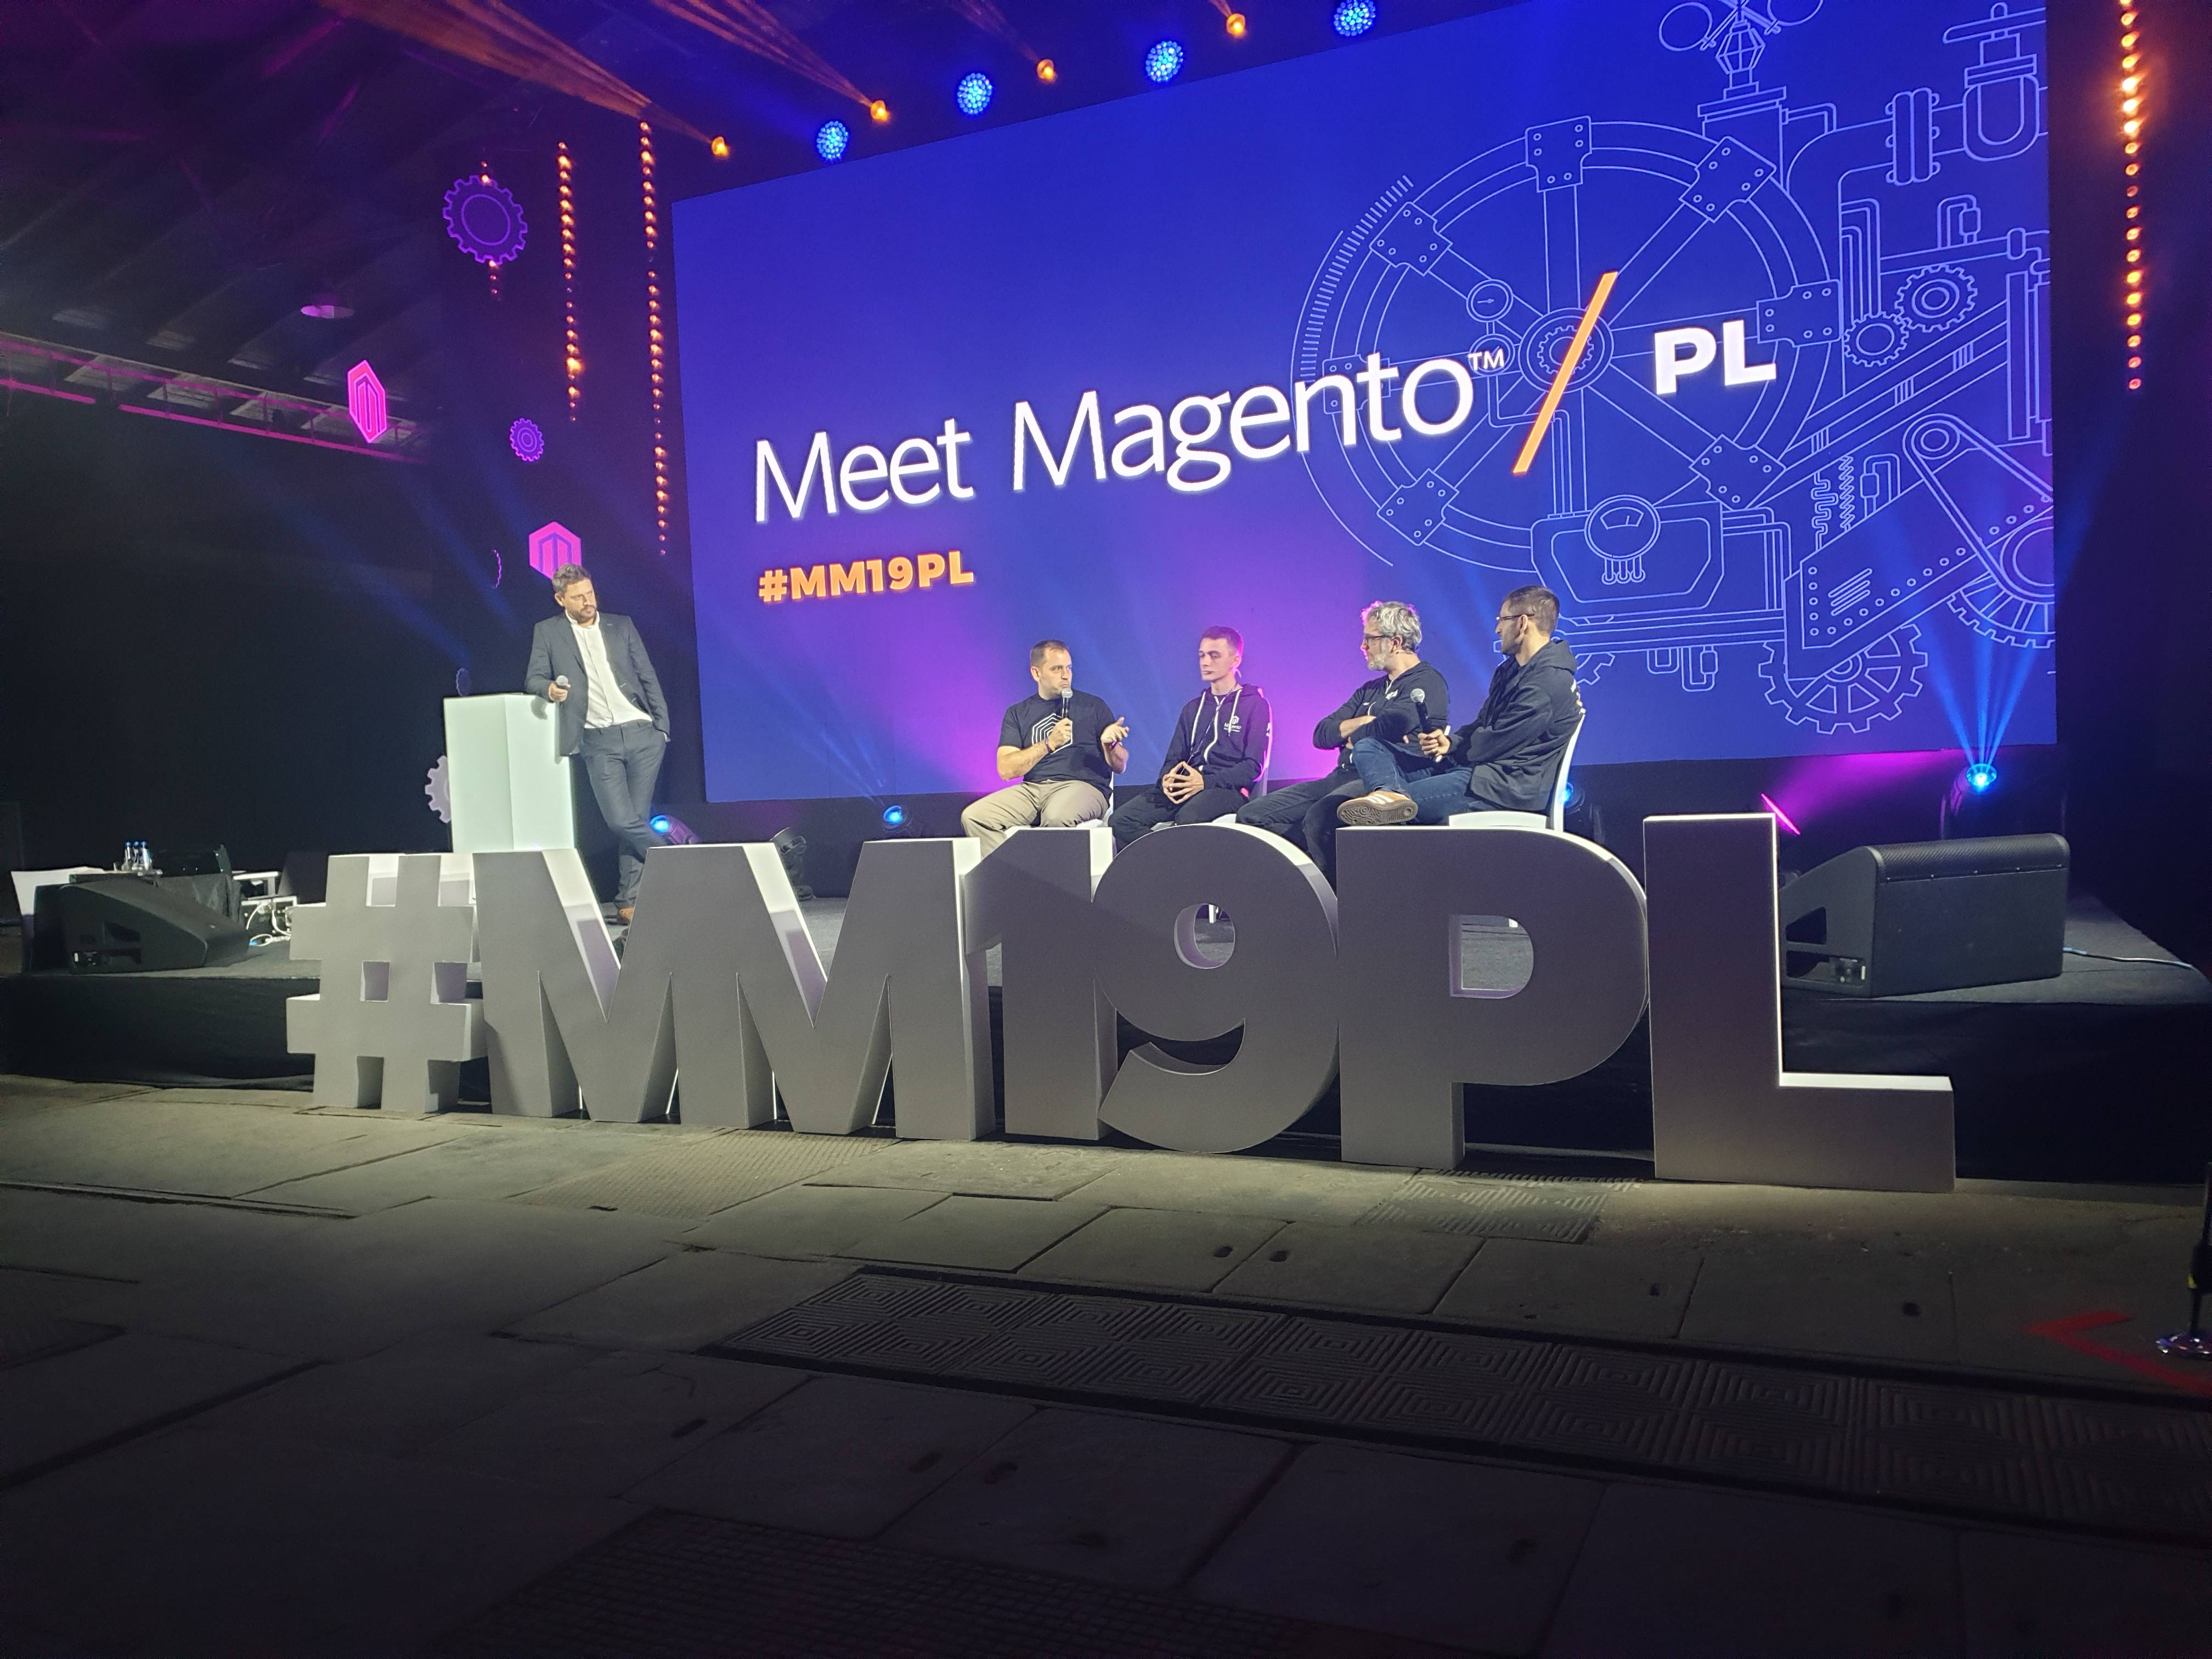 Meet Magento Poland 2019